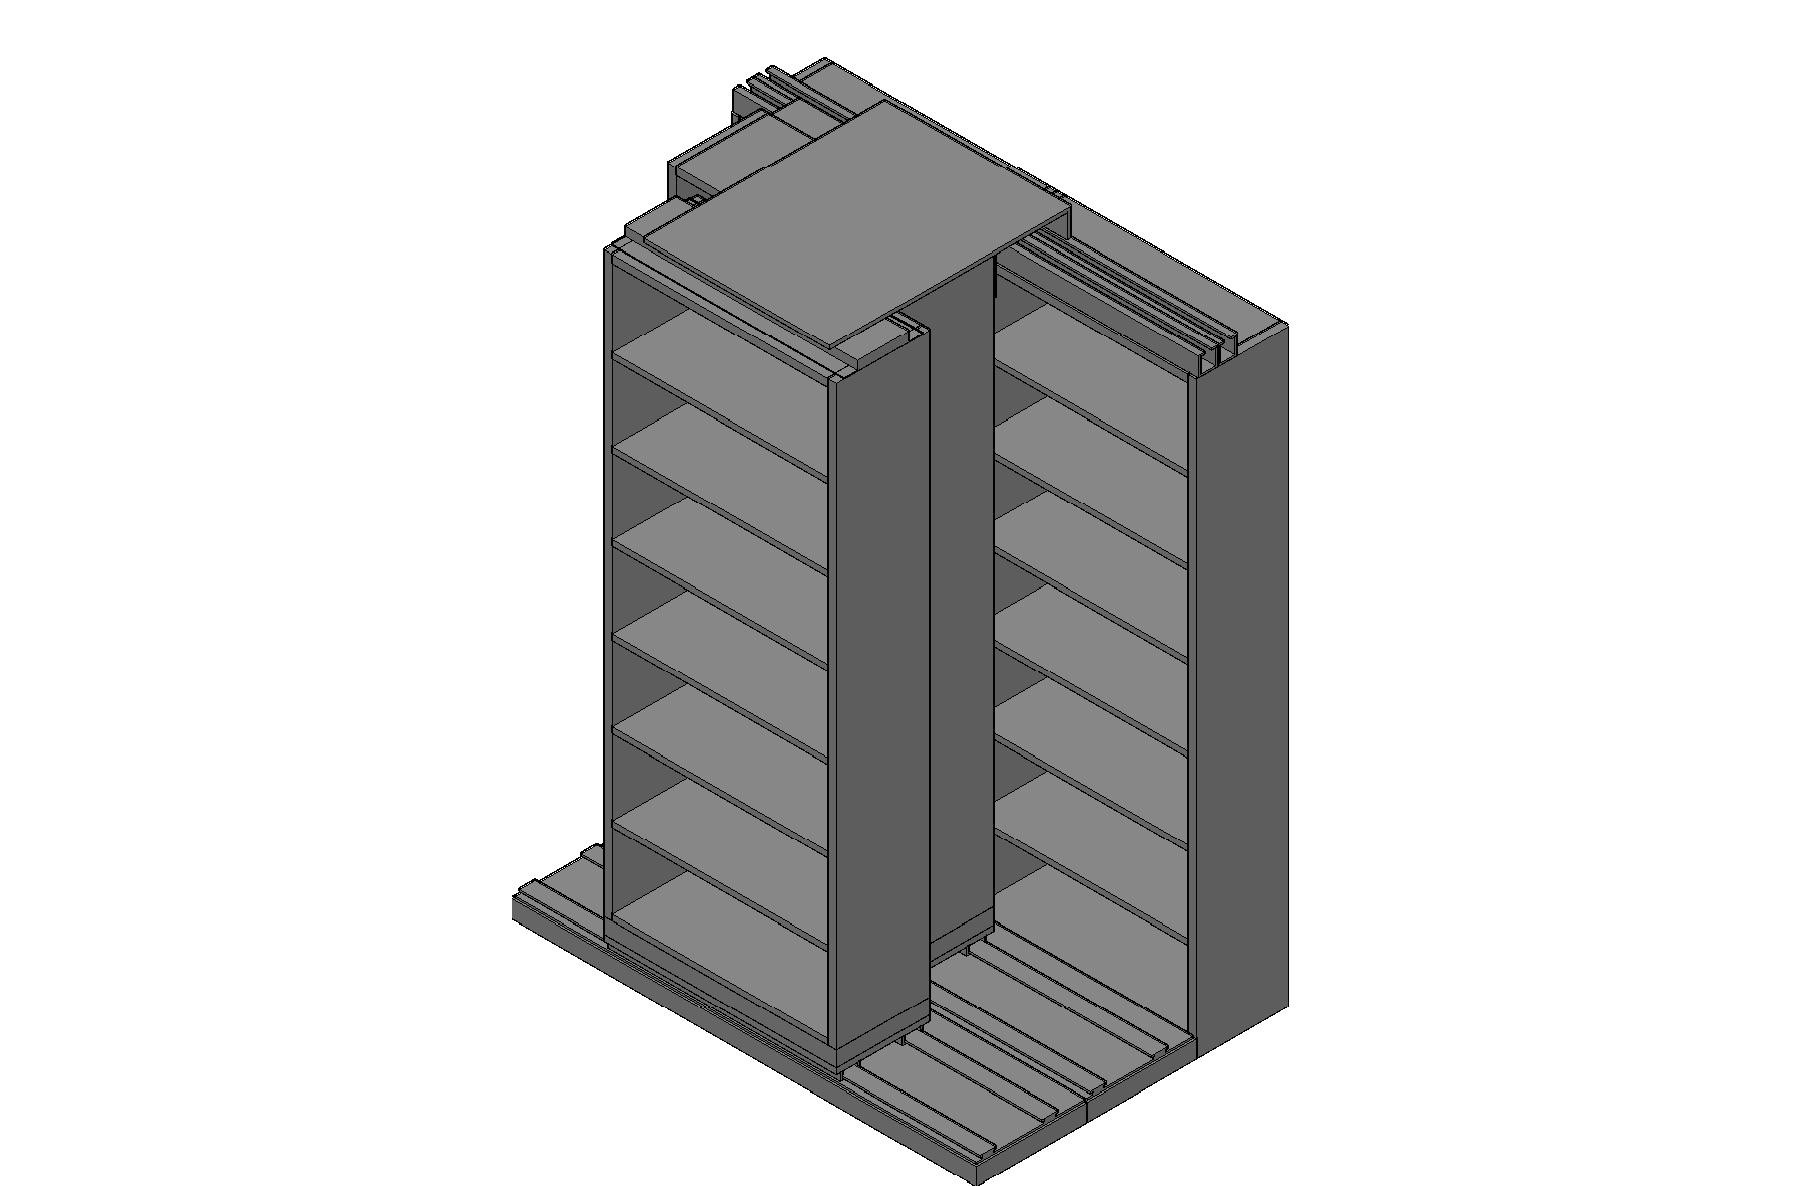 "Letter Size Sliding Shelves - 3 Rows Deep - 7 Levels - (30"" x 12"" Shelves) - 64"" Total Width"